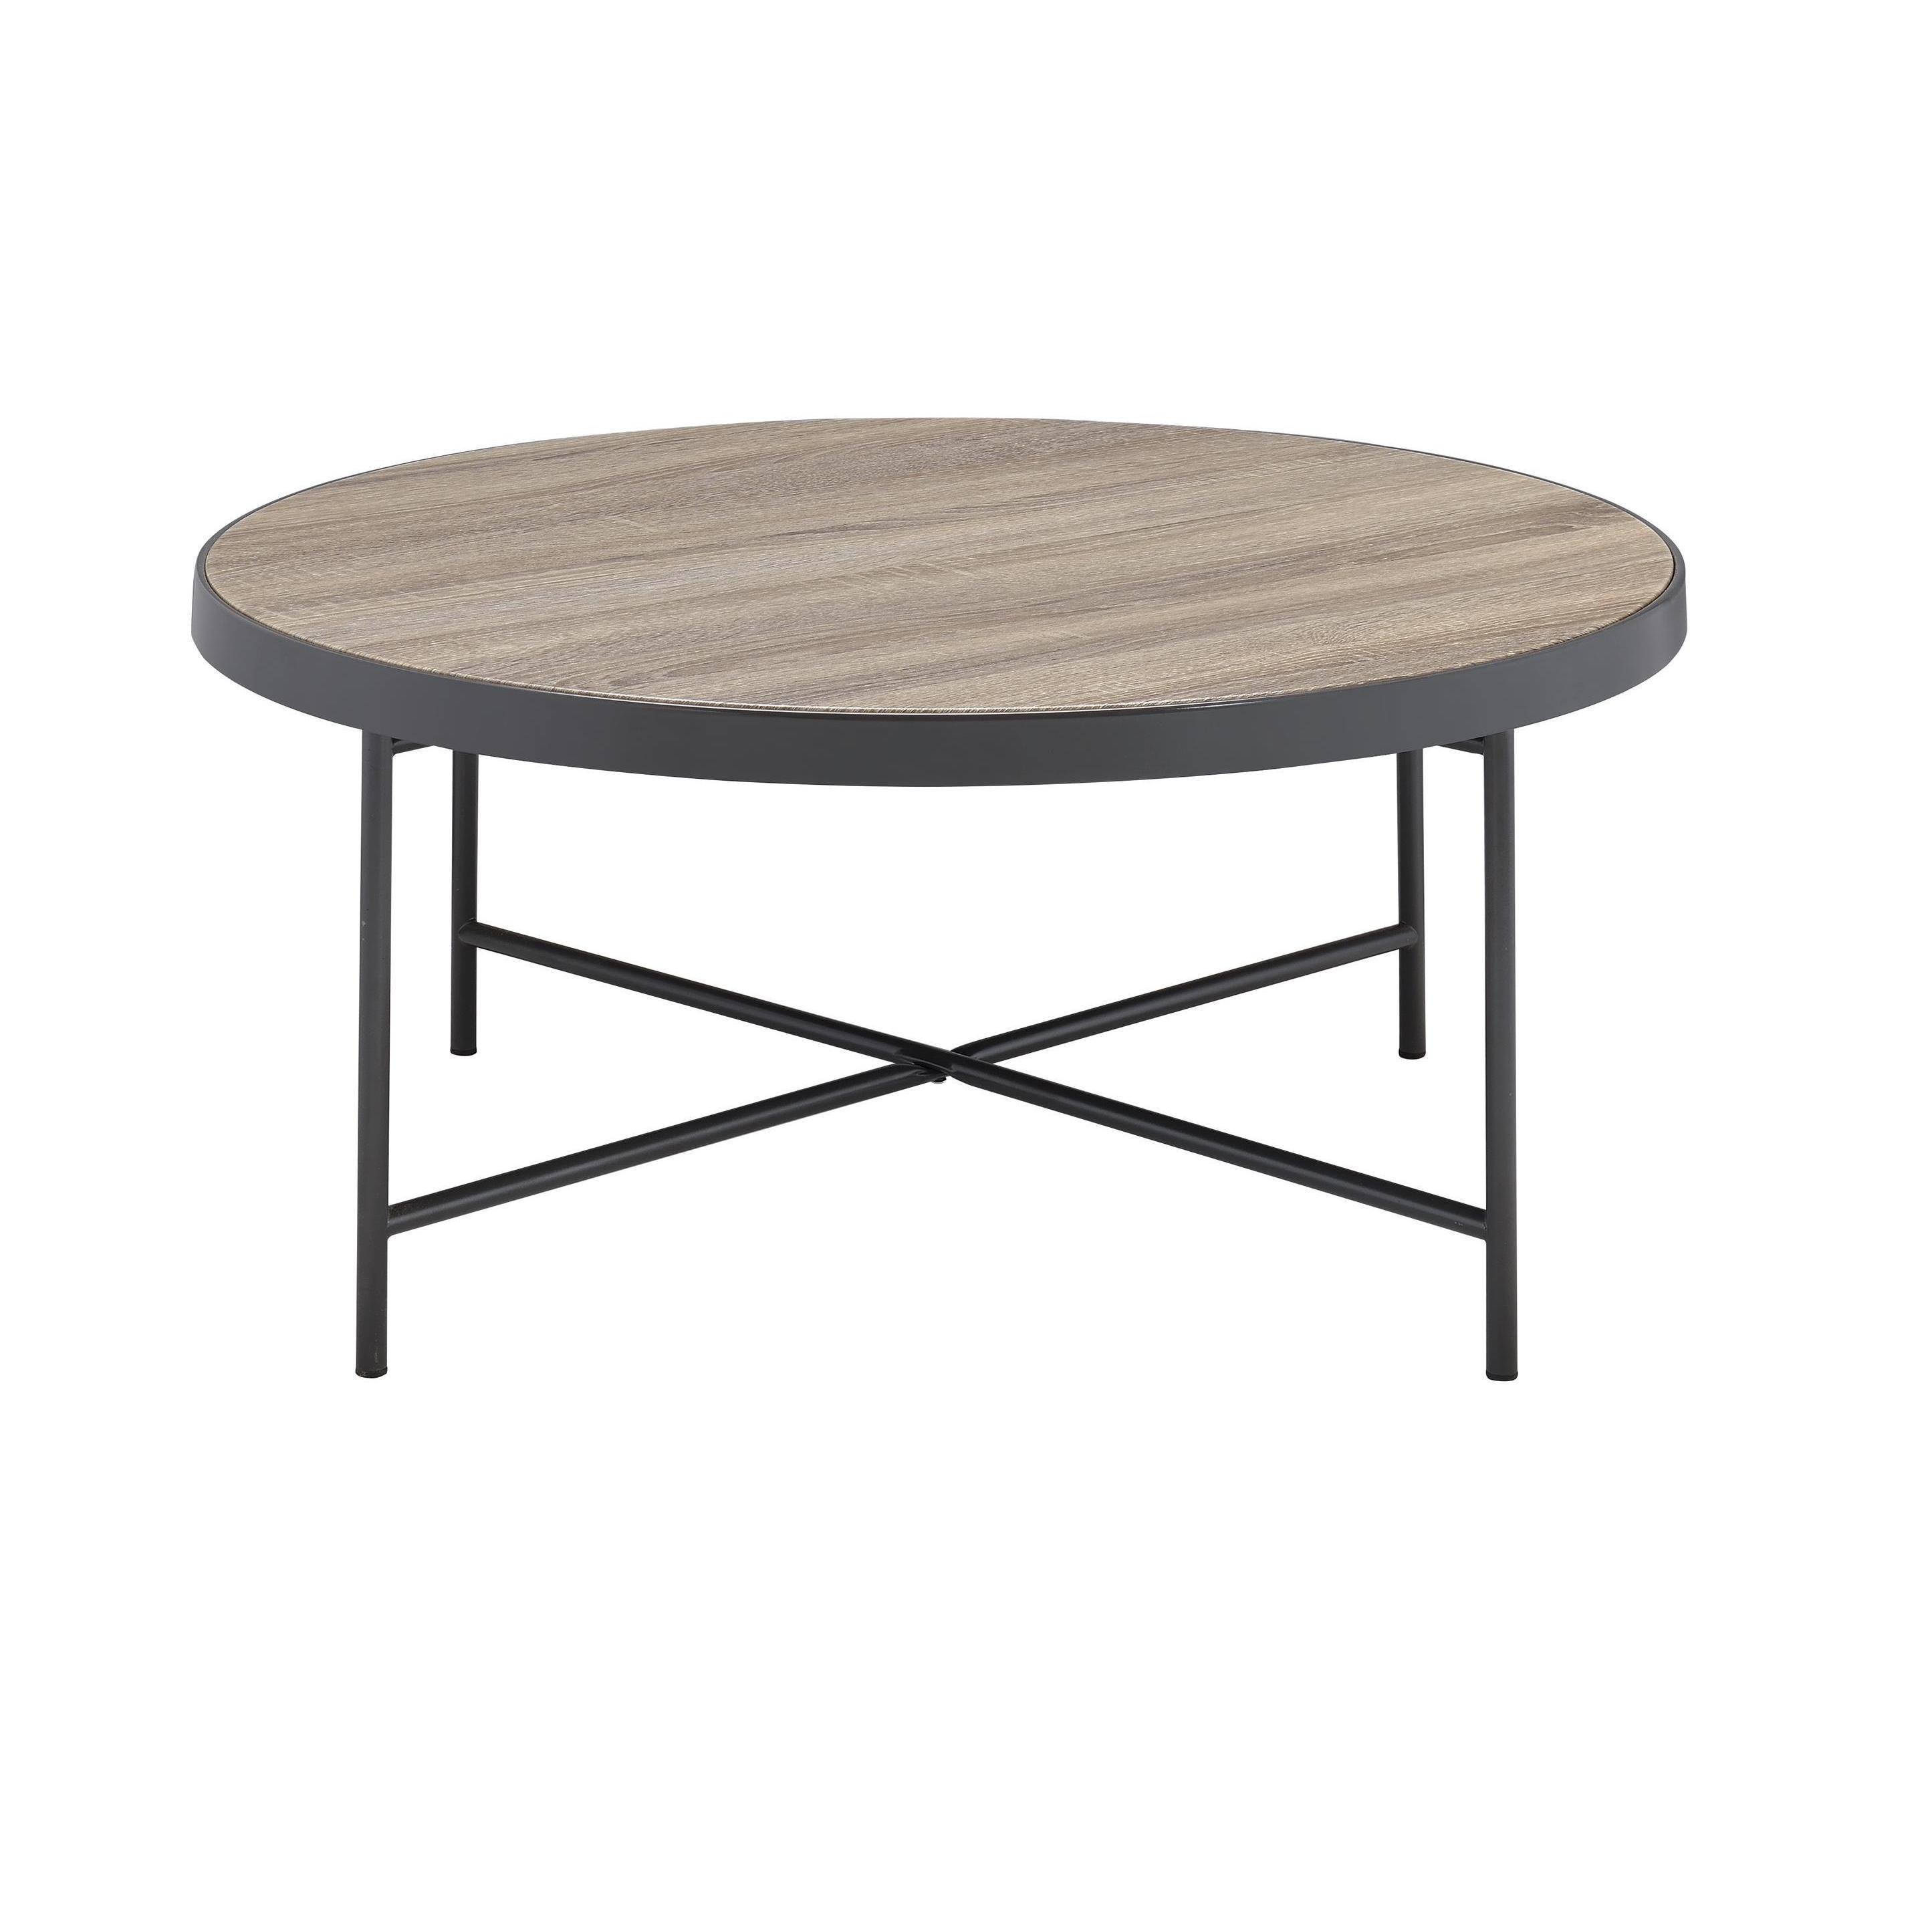 Carbon loft cartwright weathered grey oak coffee and end table carbon loft cartwright weathered grey oak coffee and end table geotapseo Image collections